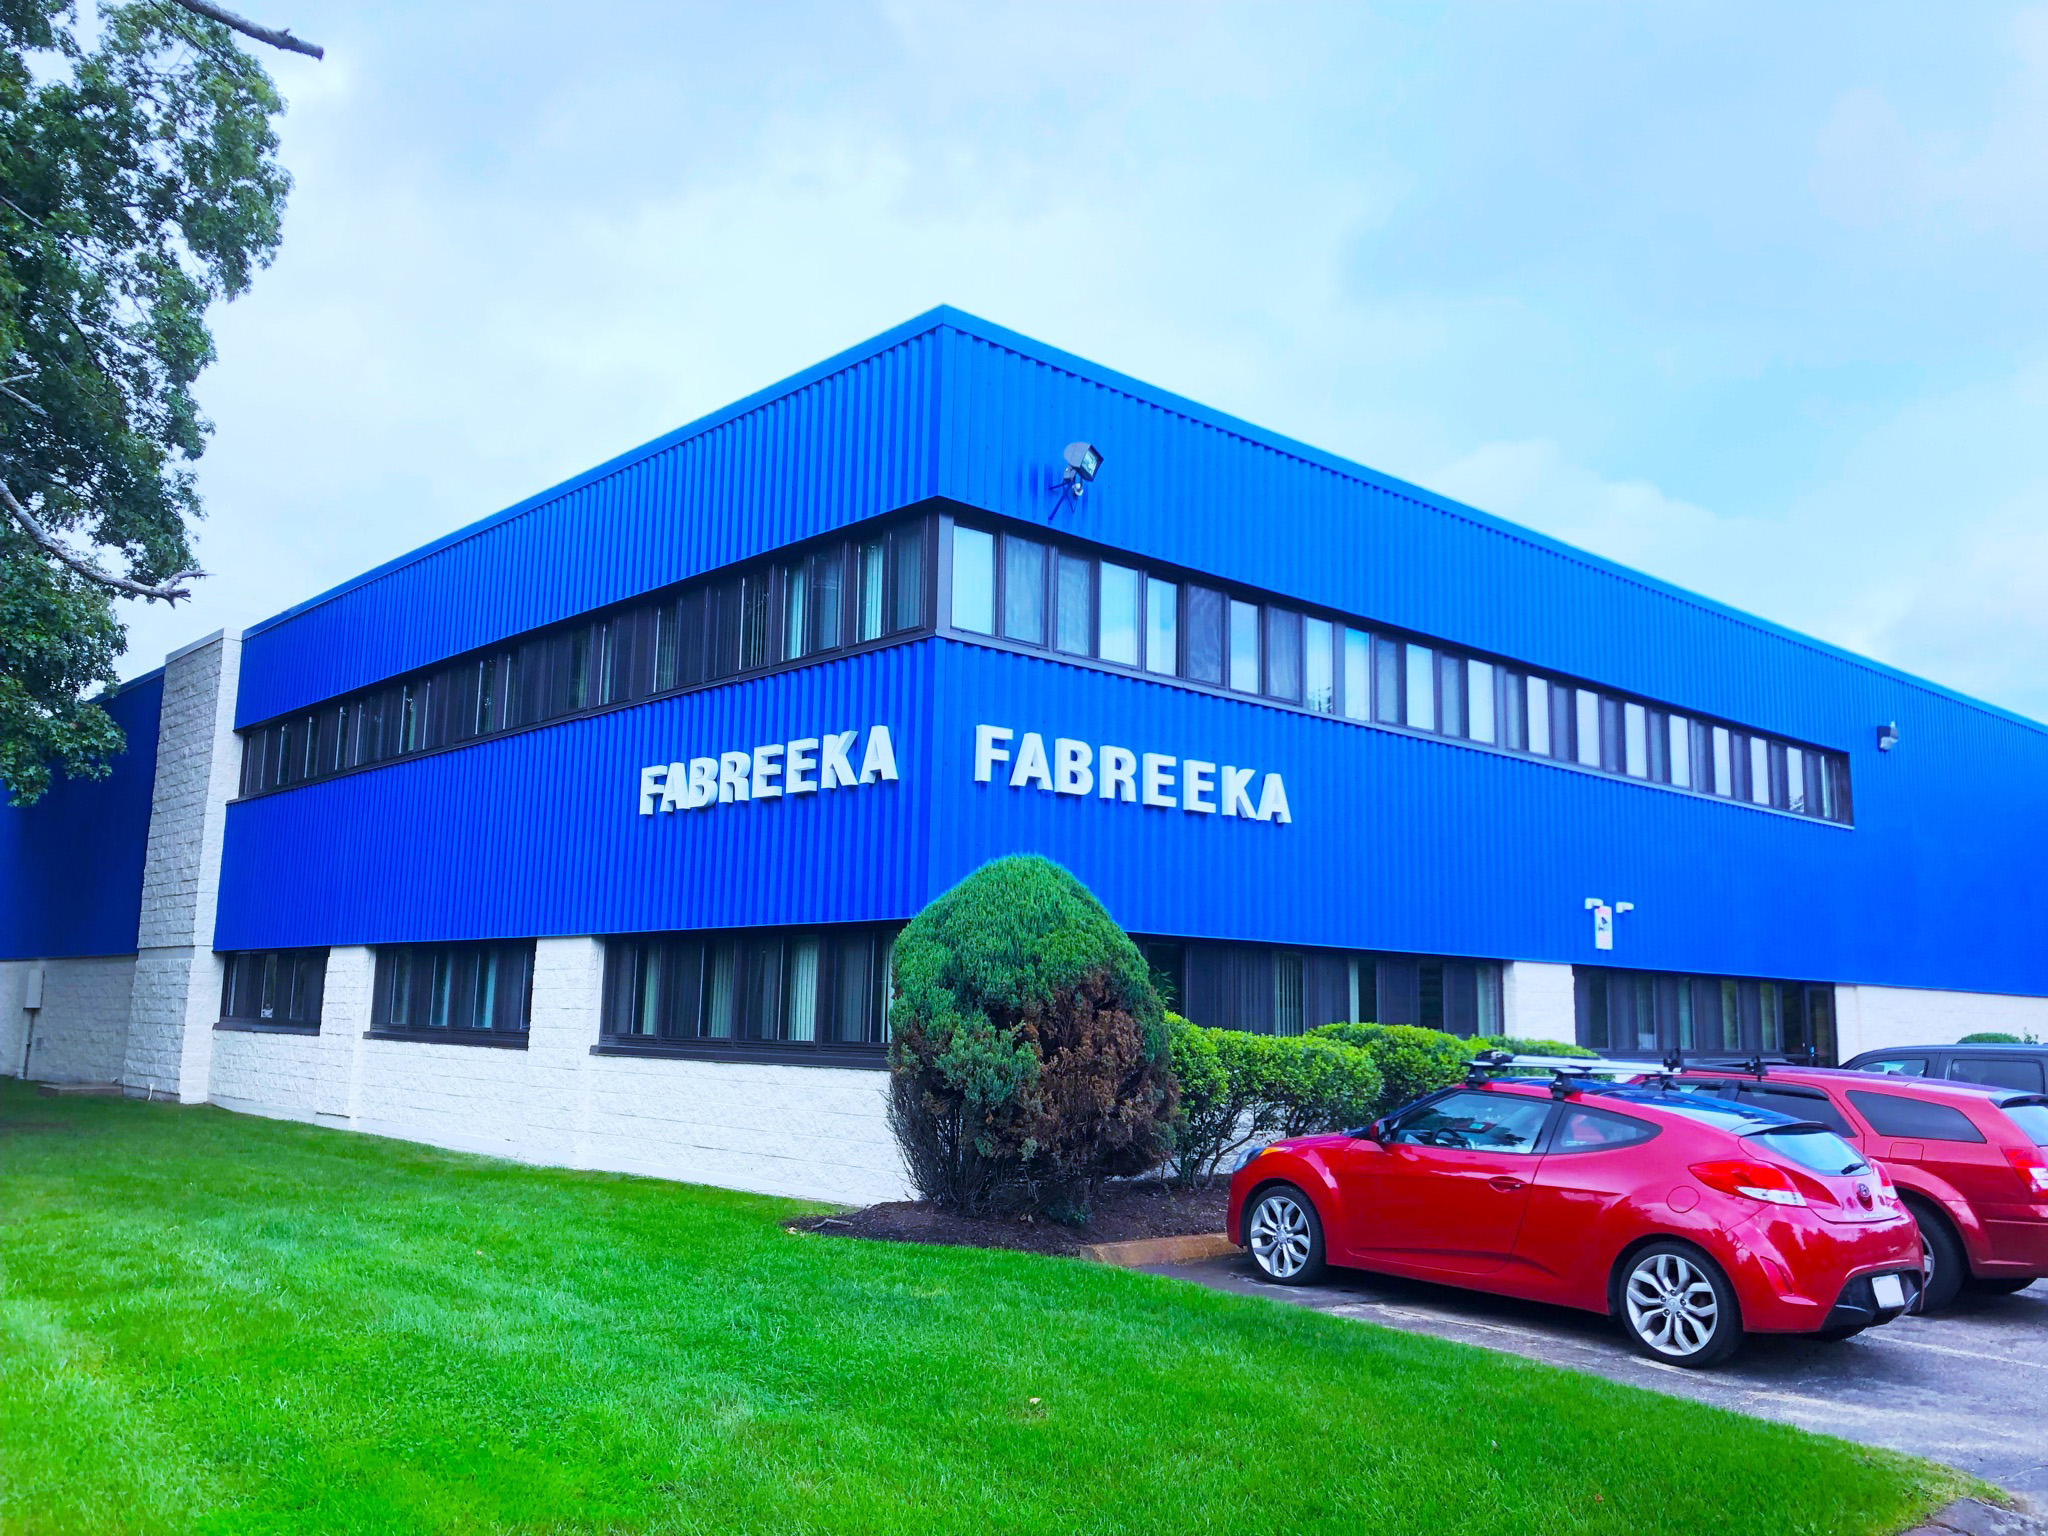 Fabreeka building